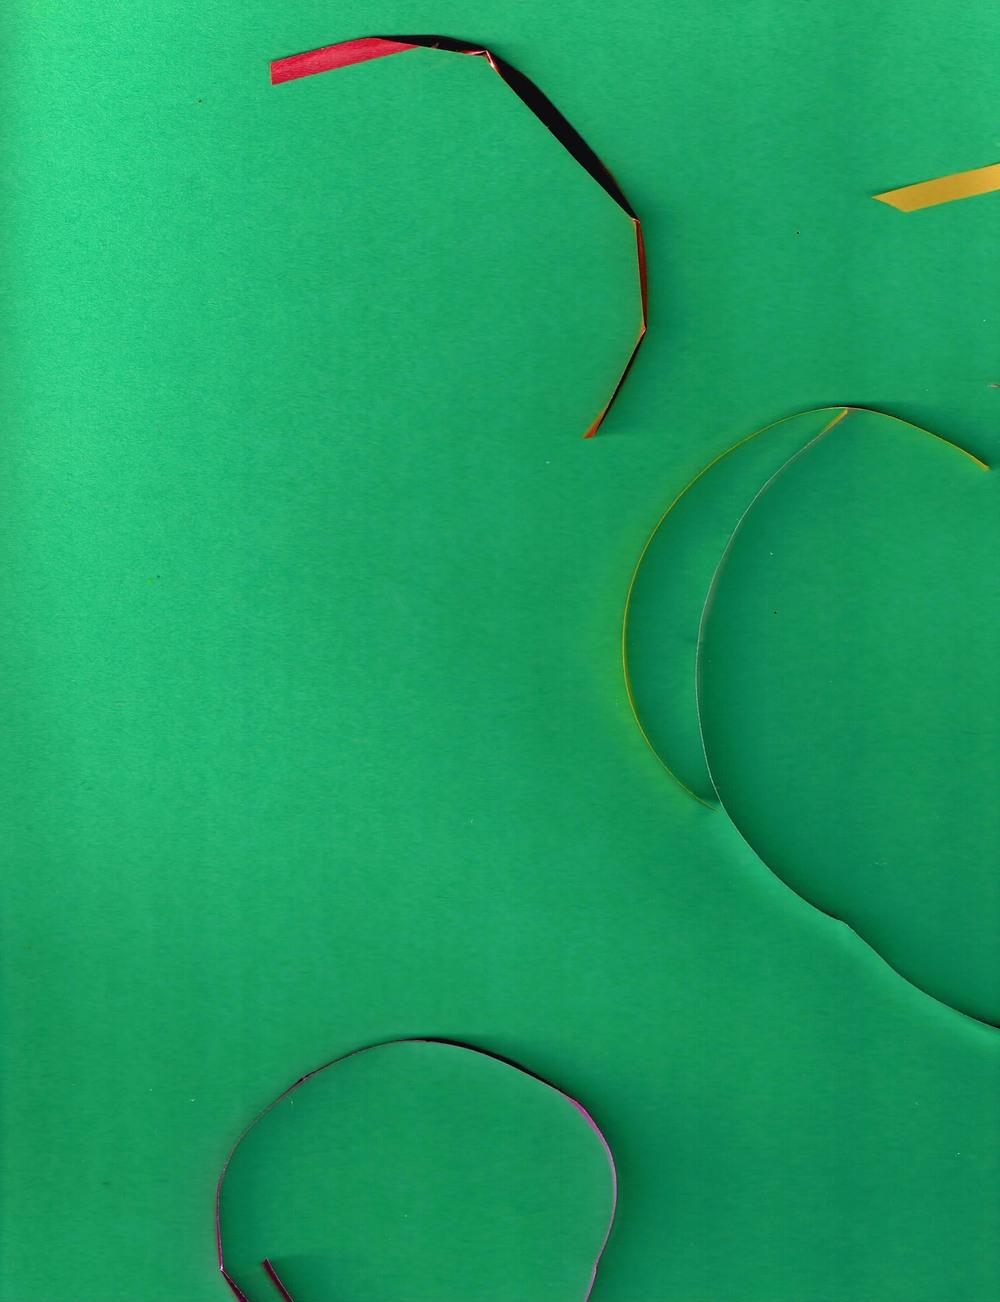 greenribbon.jpg